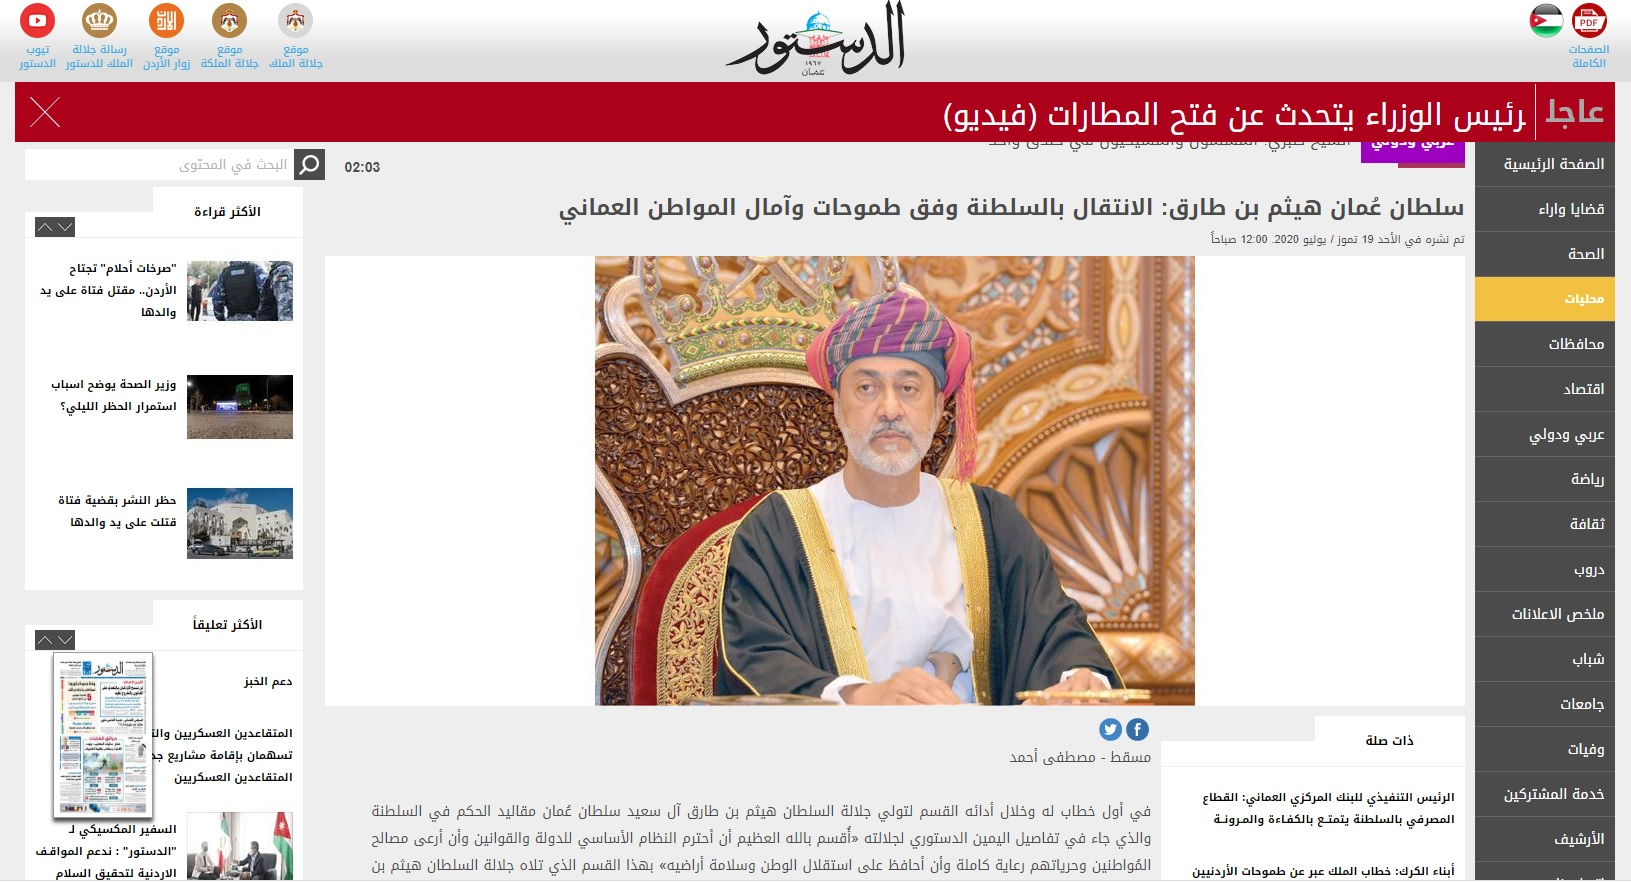 Unprecedented developments in Oman since HM Sultan Haitham's accession to power: Al Dastoor Daily